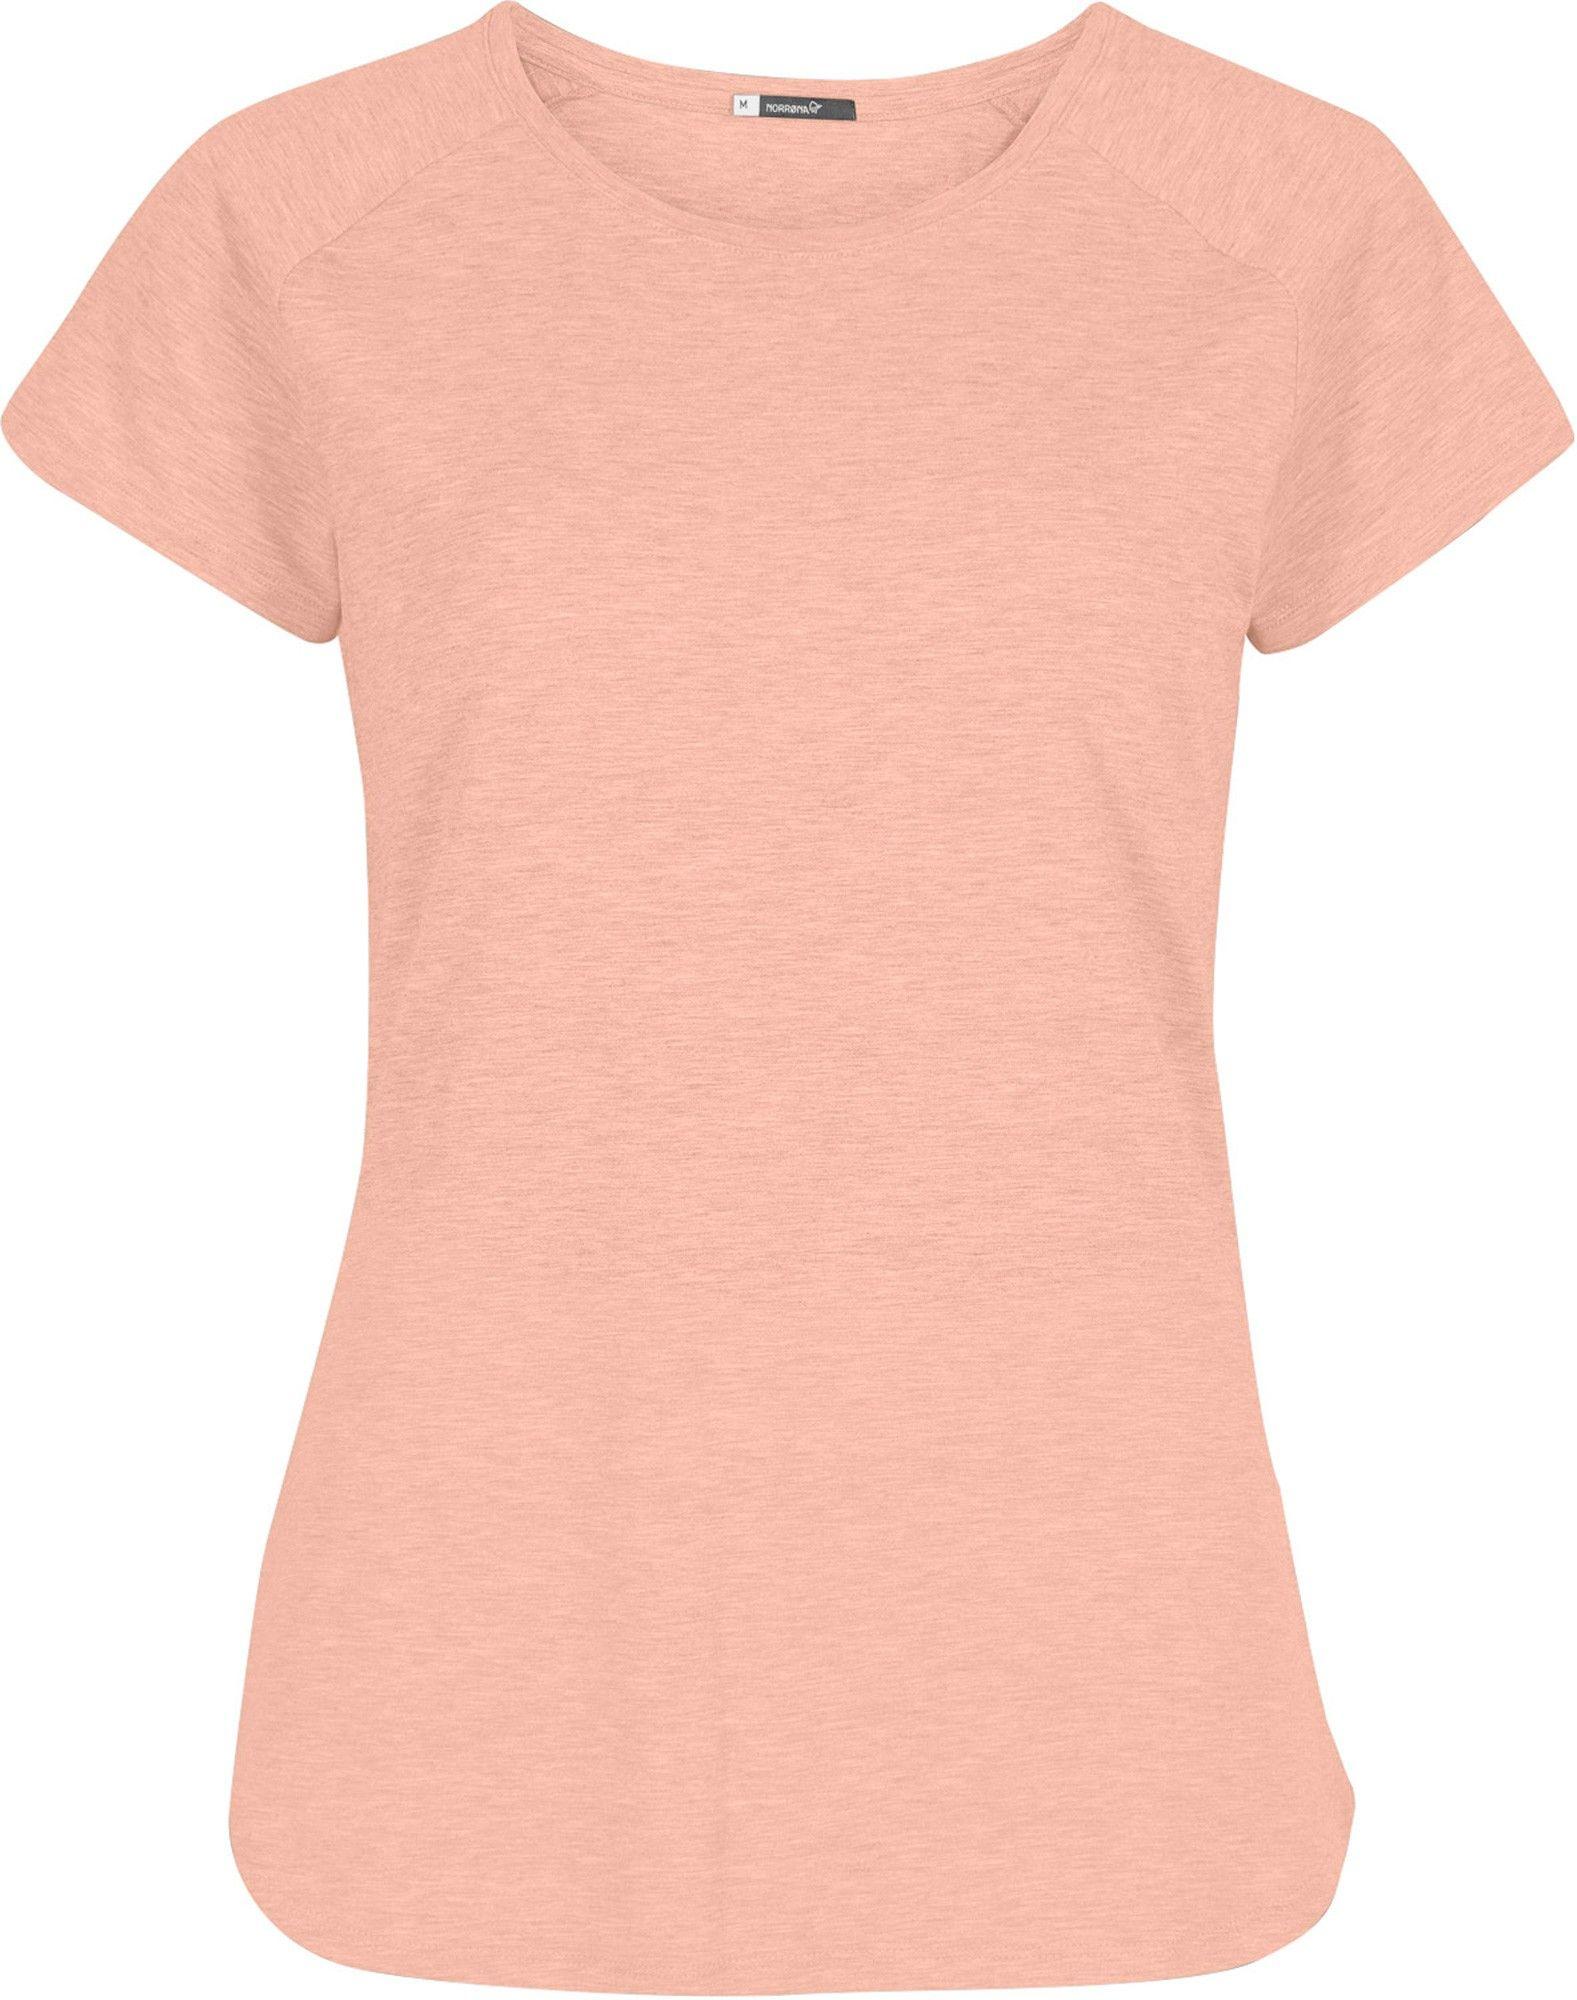 Norrona W /29 Tencel T-Shirt | Größe XS,S,M,L | Damen Kurzarm-Shirt